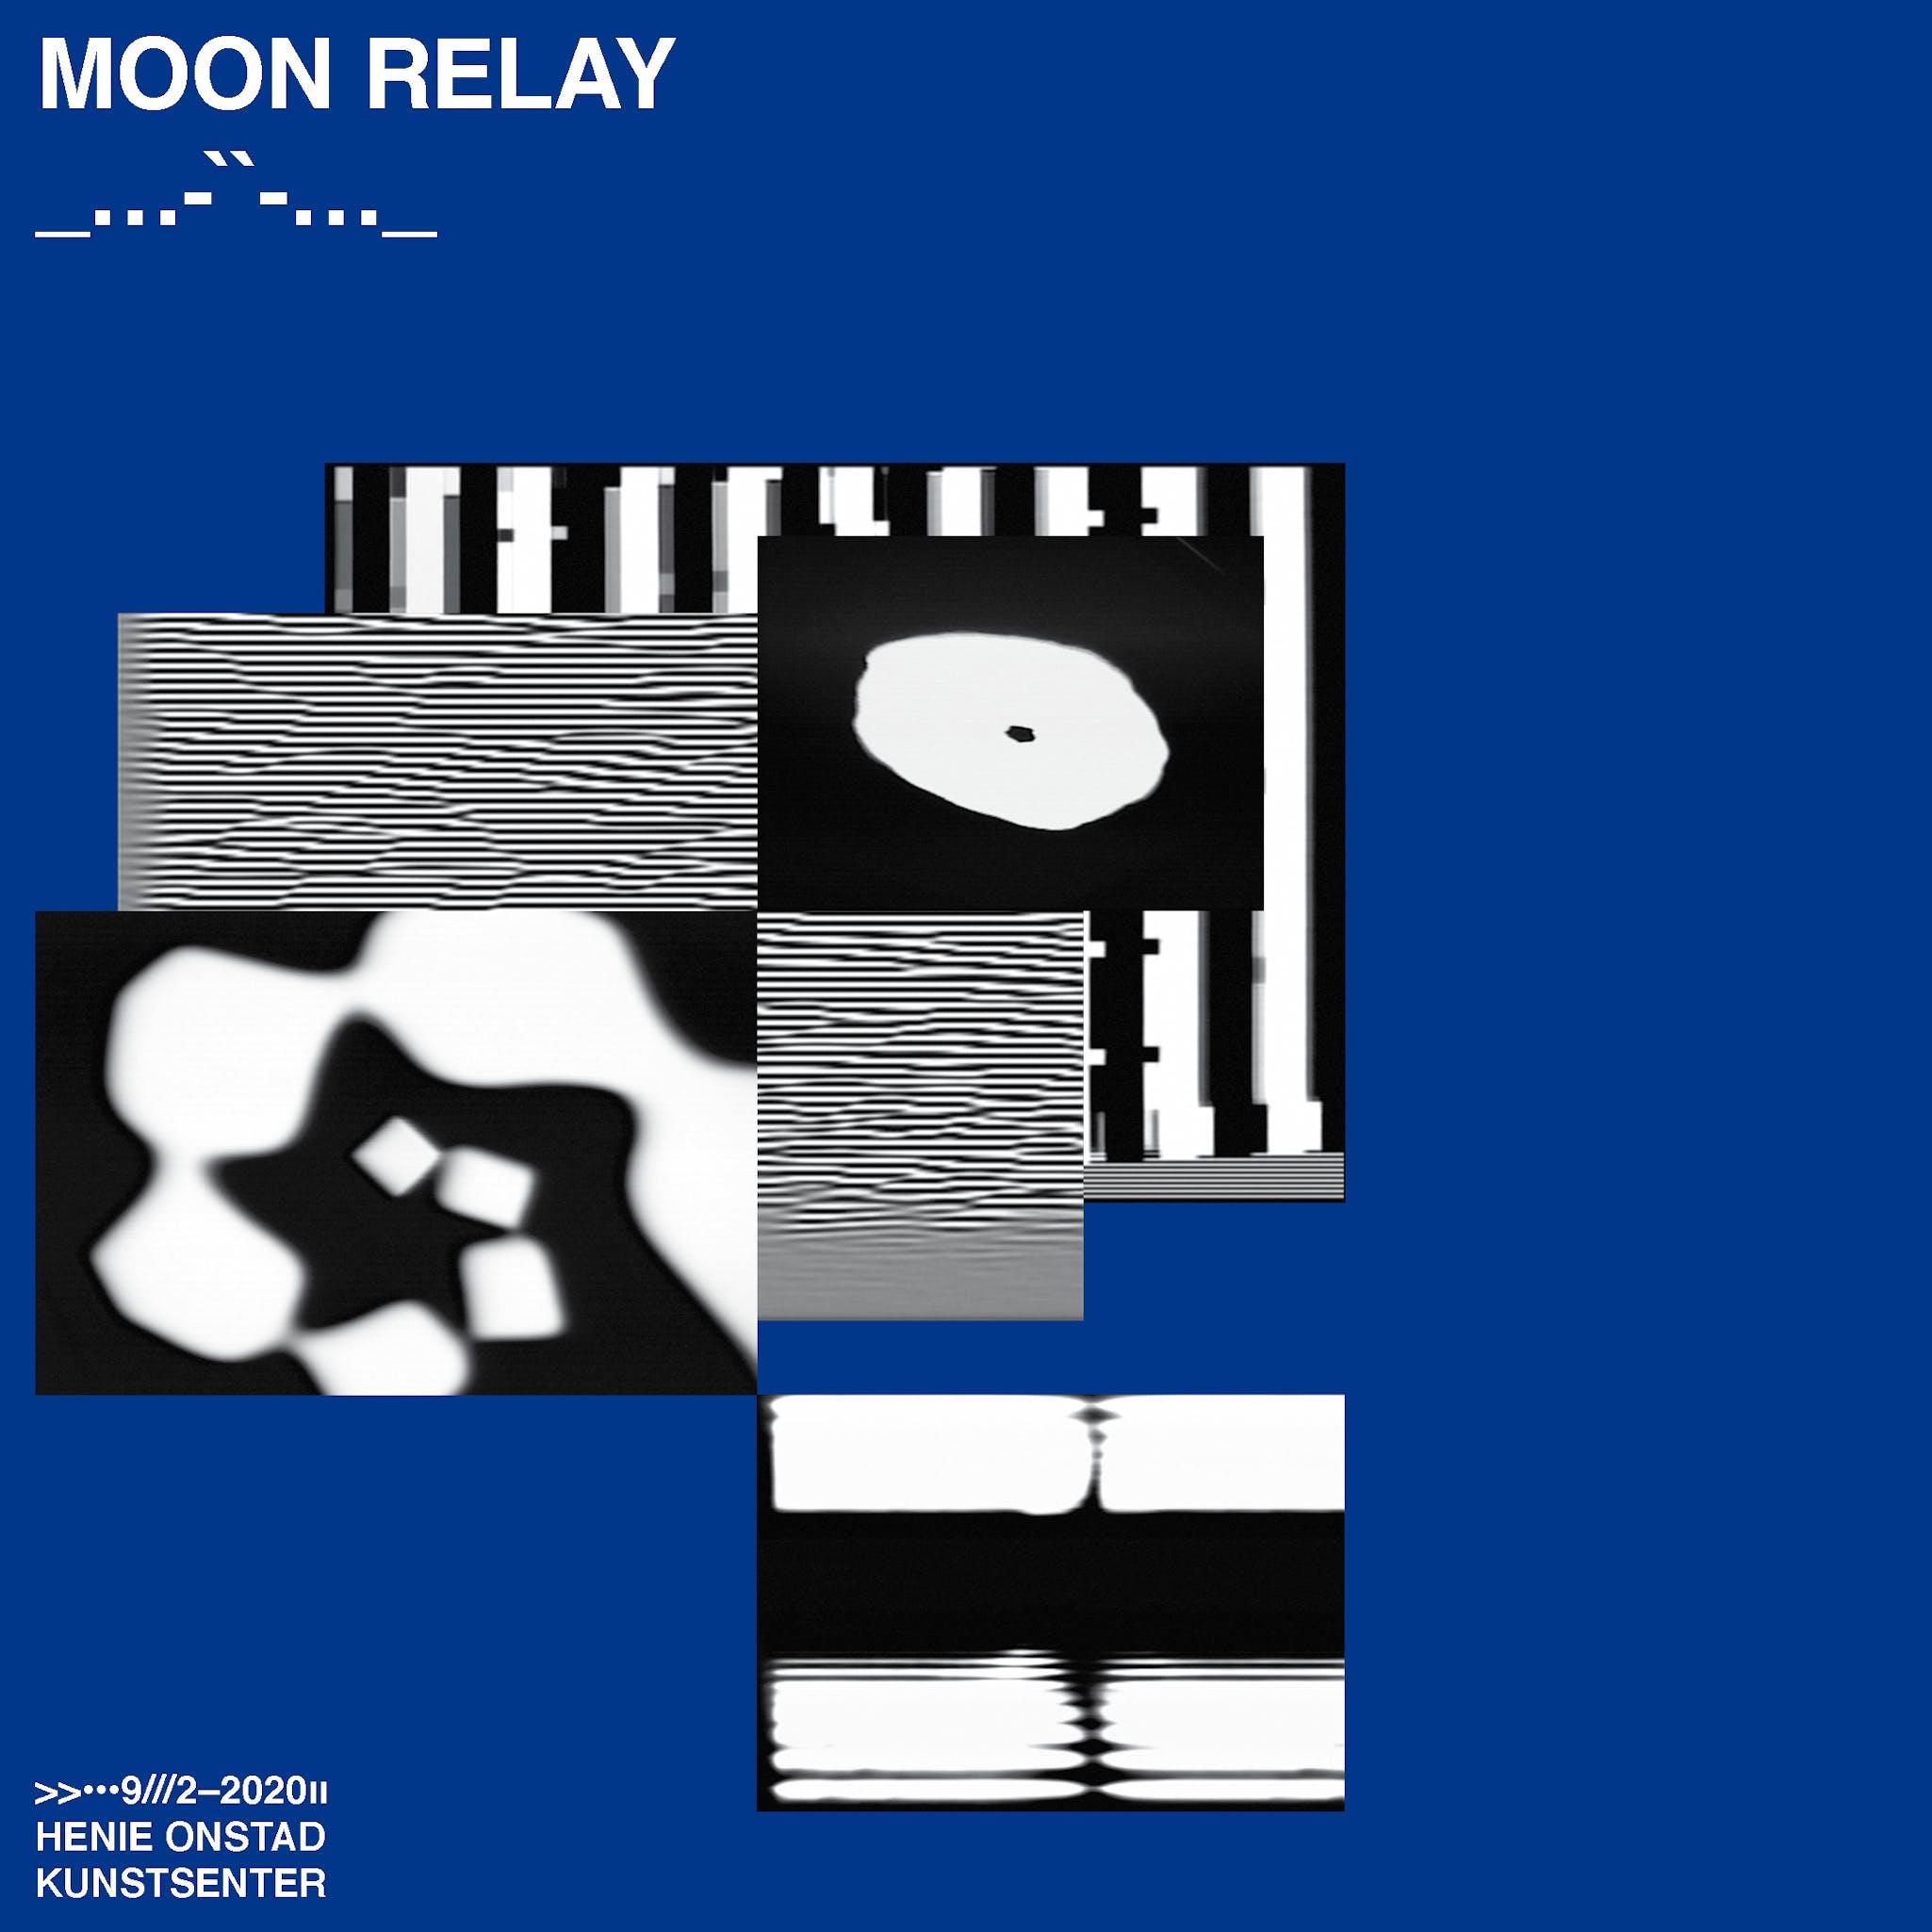 Moon Relay HOK 2020 some IG1